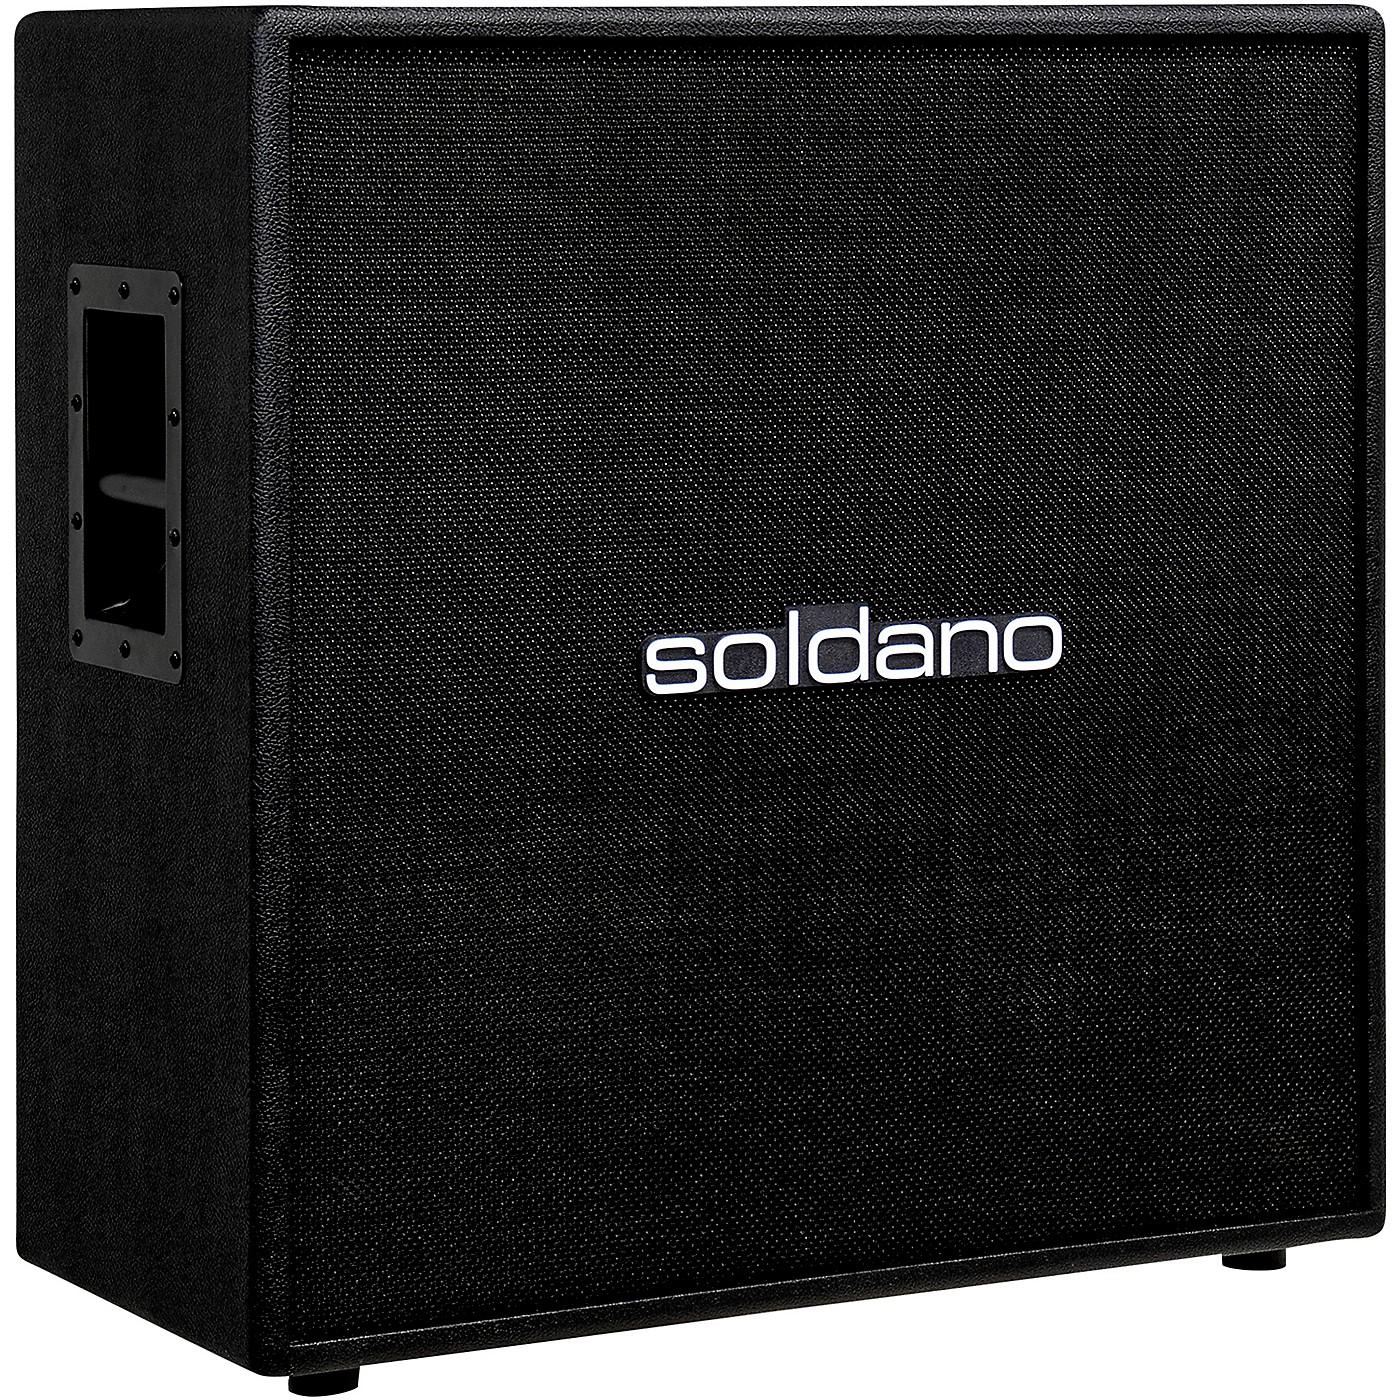 Soldano 4x12 Vintage 30 Cab thumbnail